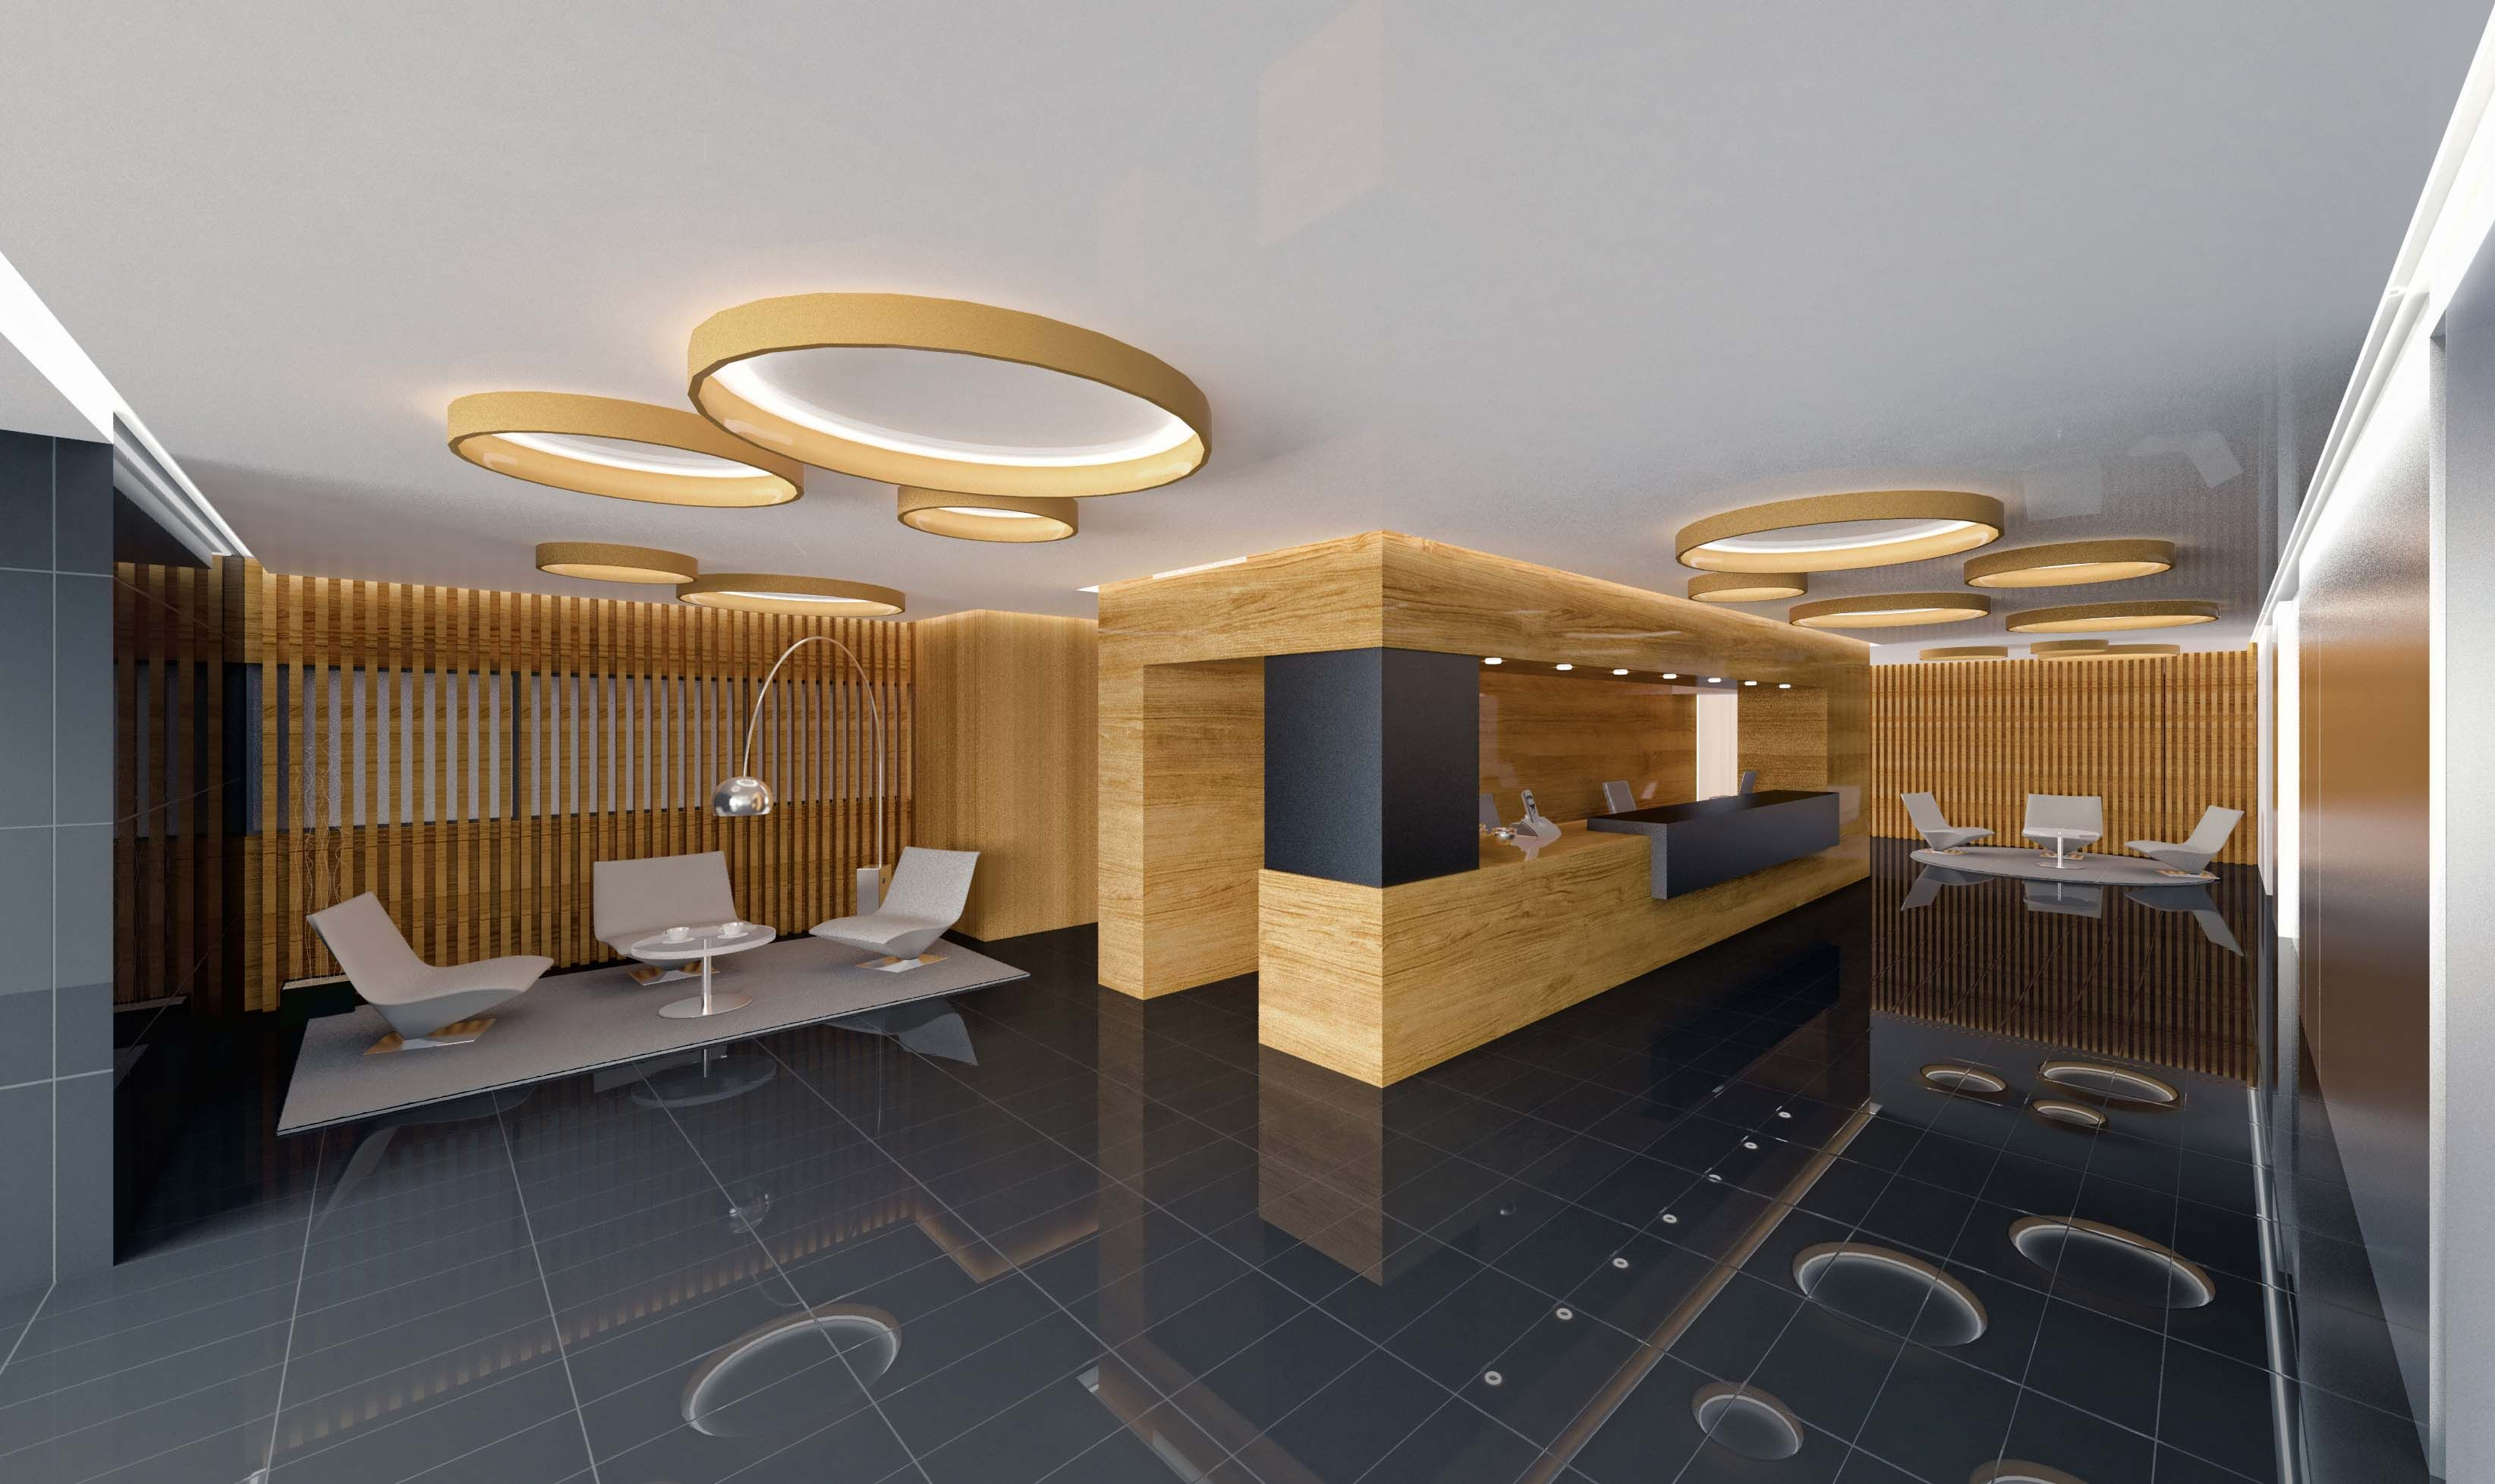 Vest bulo del nuevo hotel de laboratorio de arquitectura for Arquitectura de hoteles